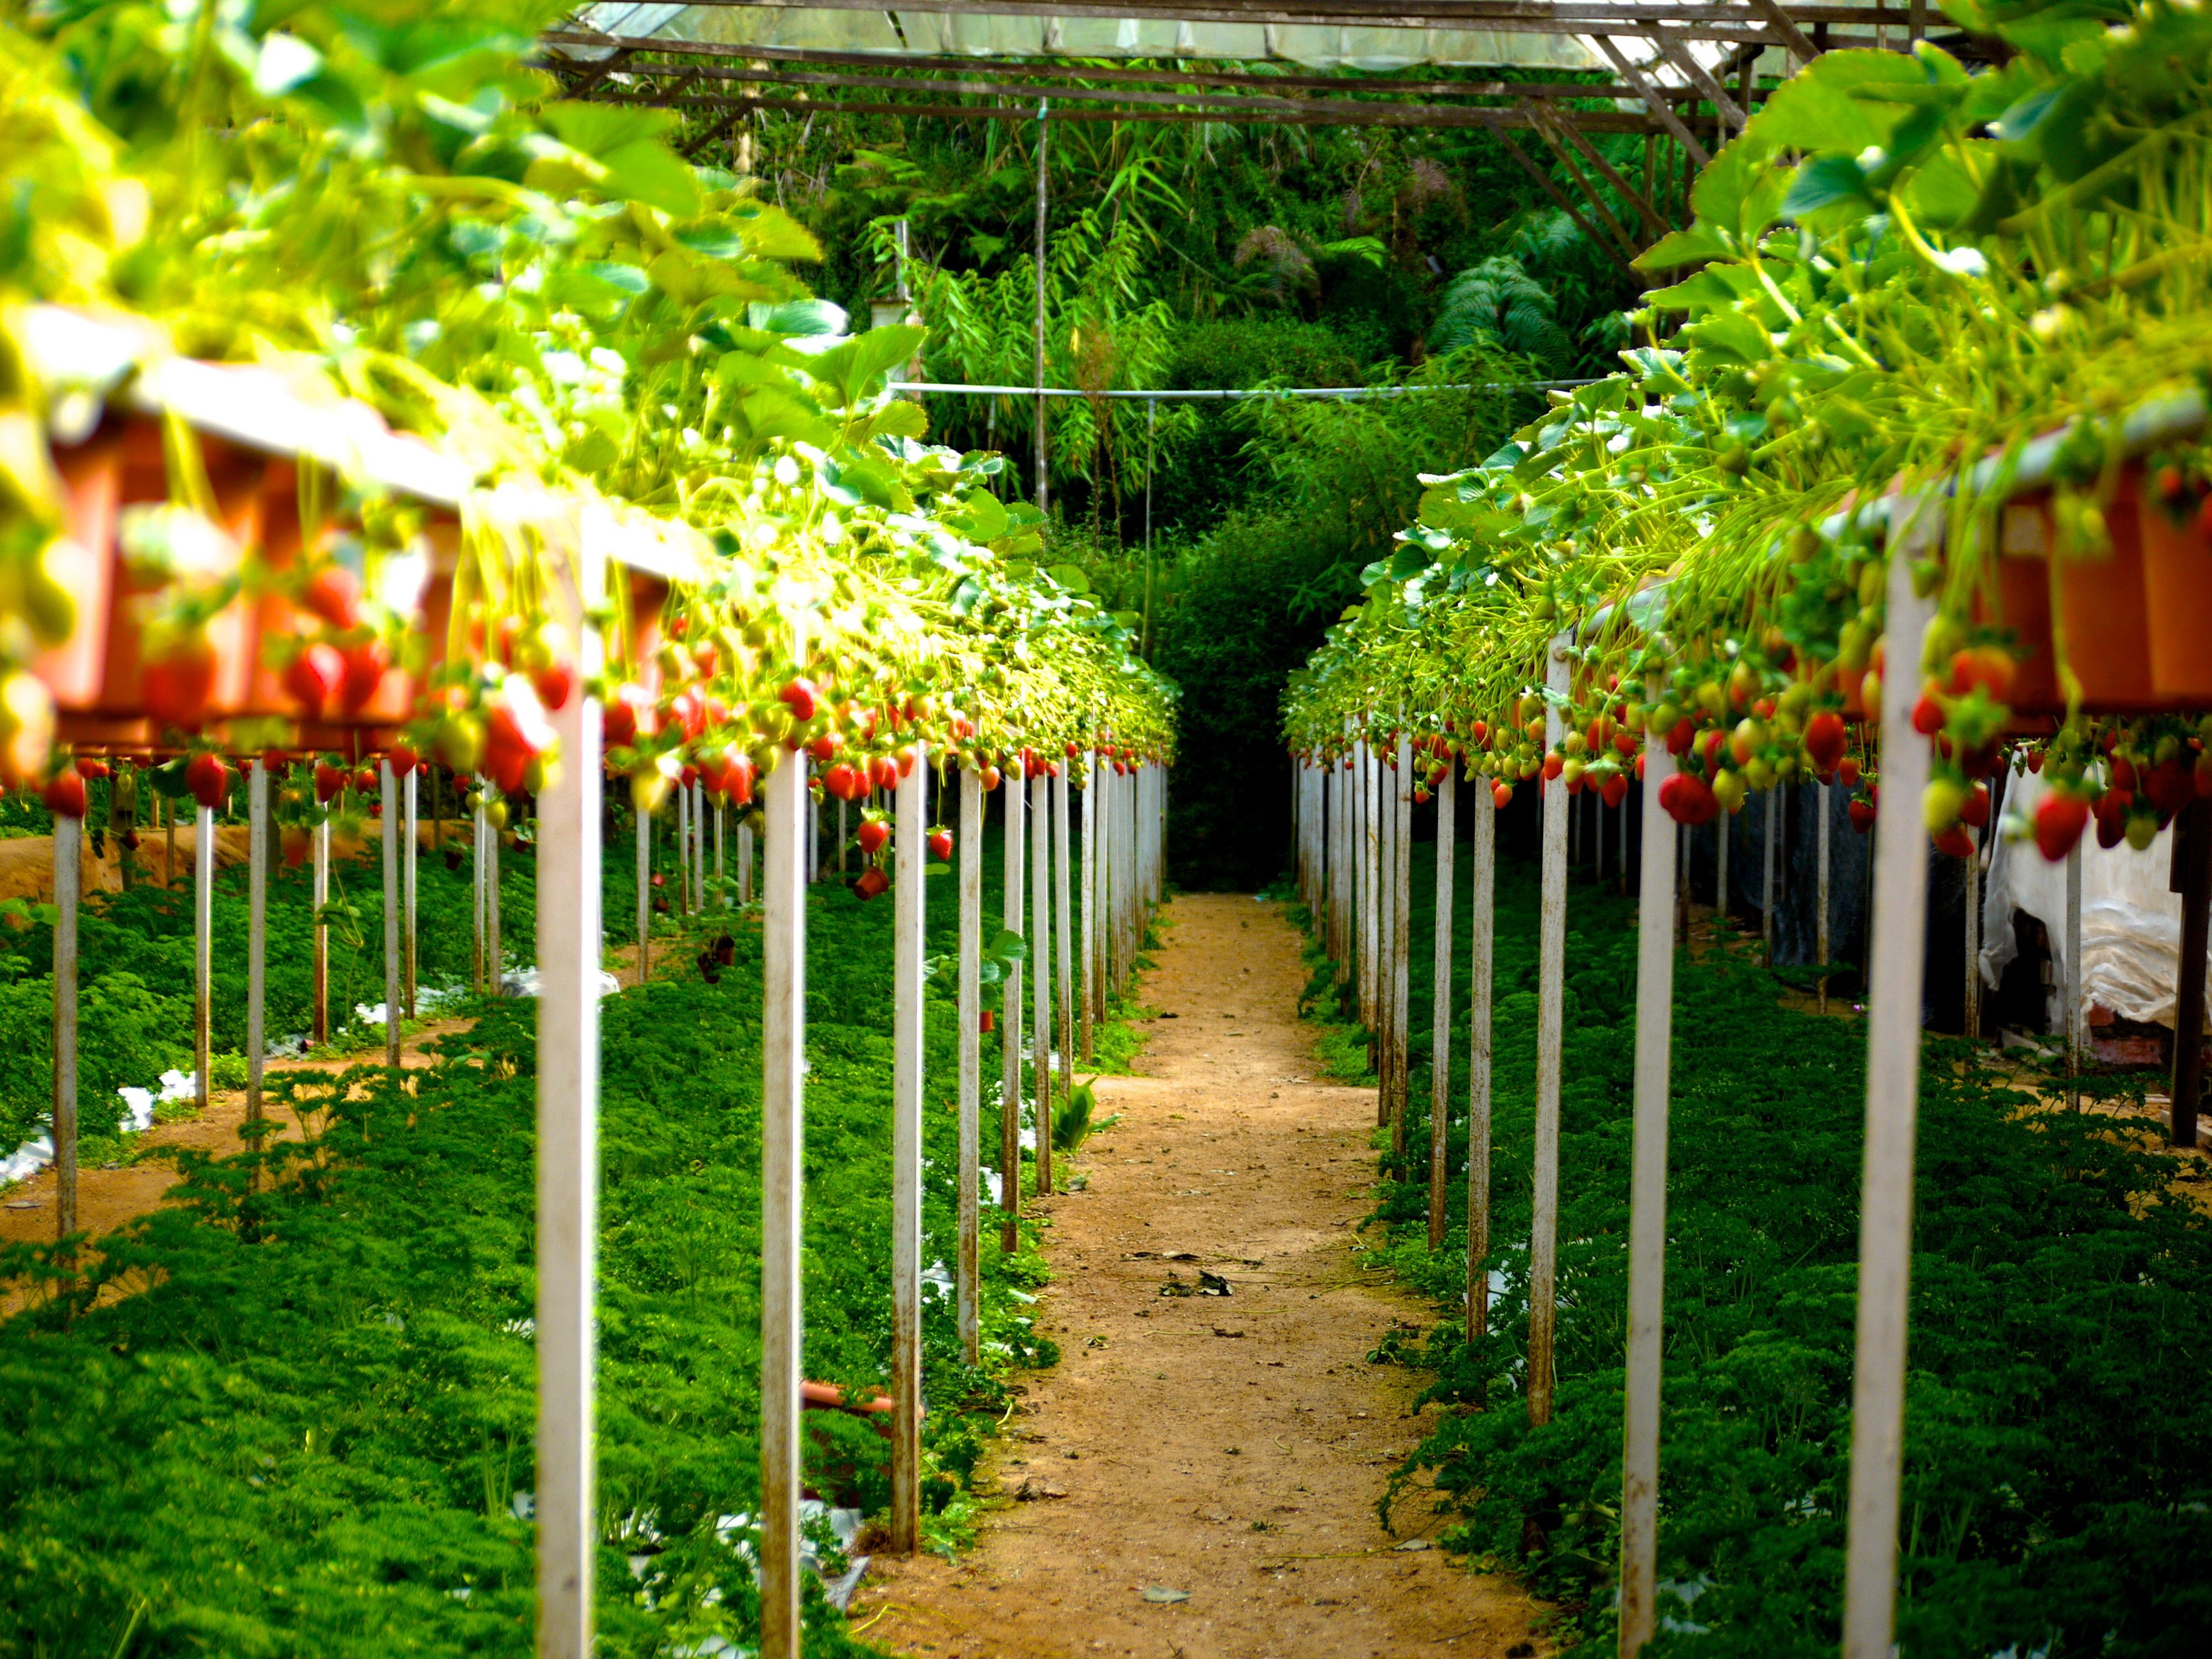 menanam kebun anggur tanah pertanian bunga matang hijau pertanian menghasilkan botani pertanian taman rumah kaca stroberi & Gambar : menanam kebun anggur tanah pertanian bunga matang ...